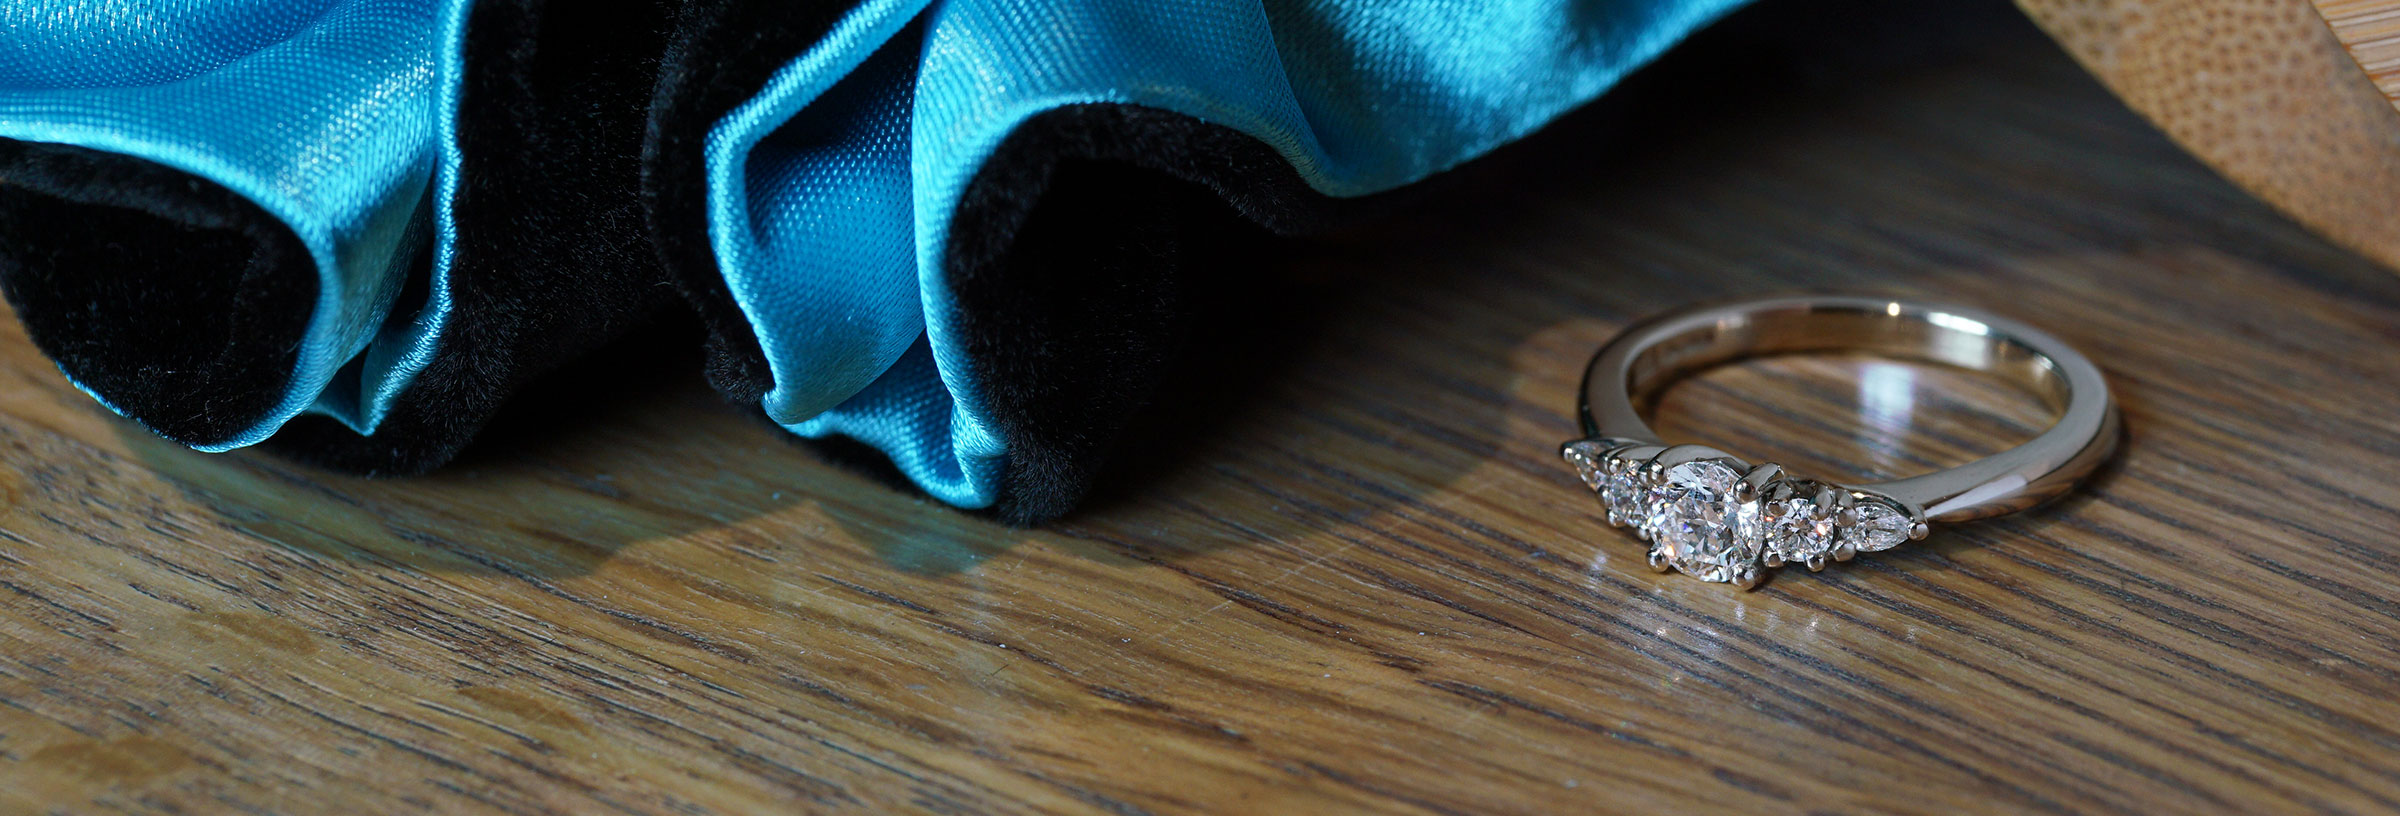 platinum-and-mixed-cut-diamond-ring